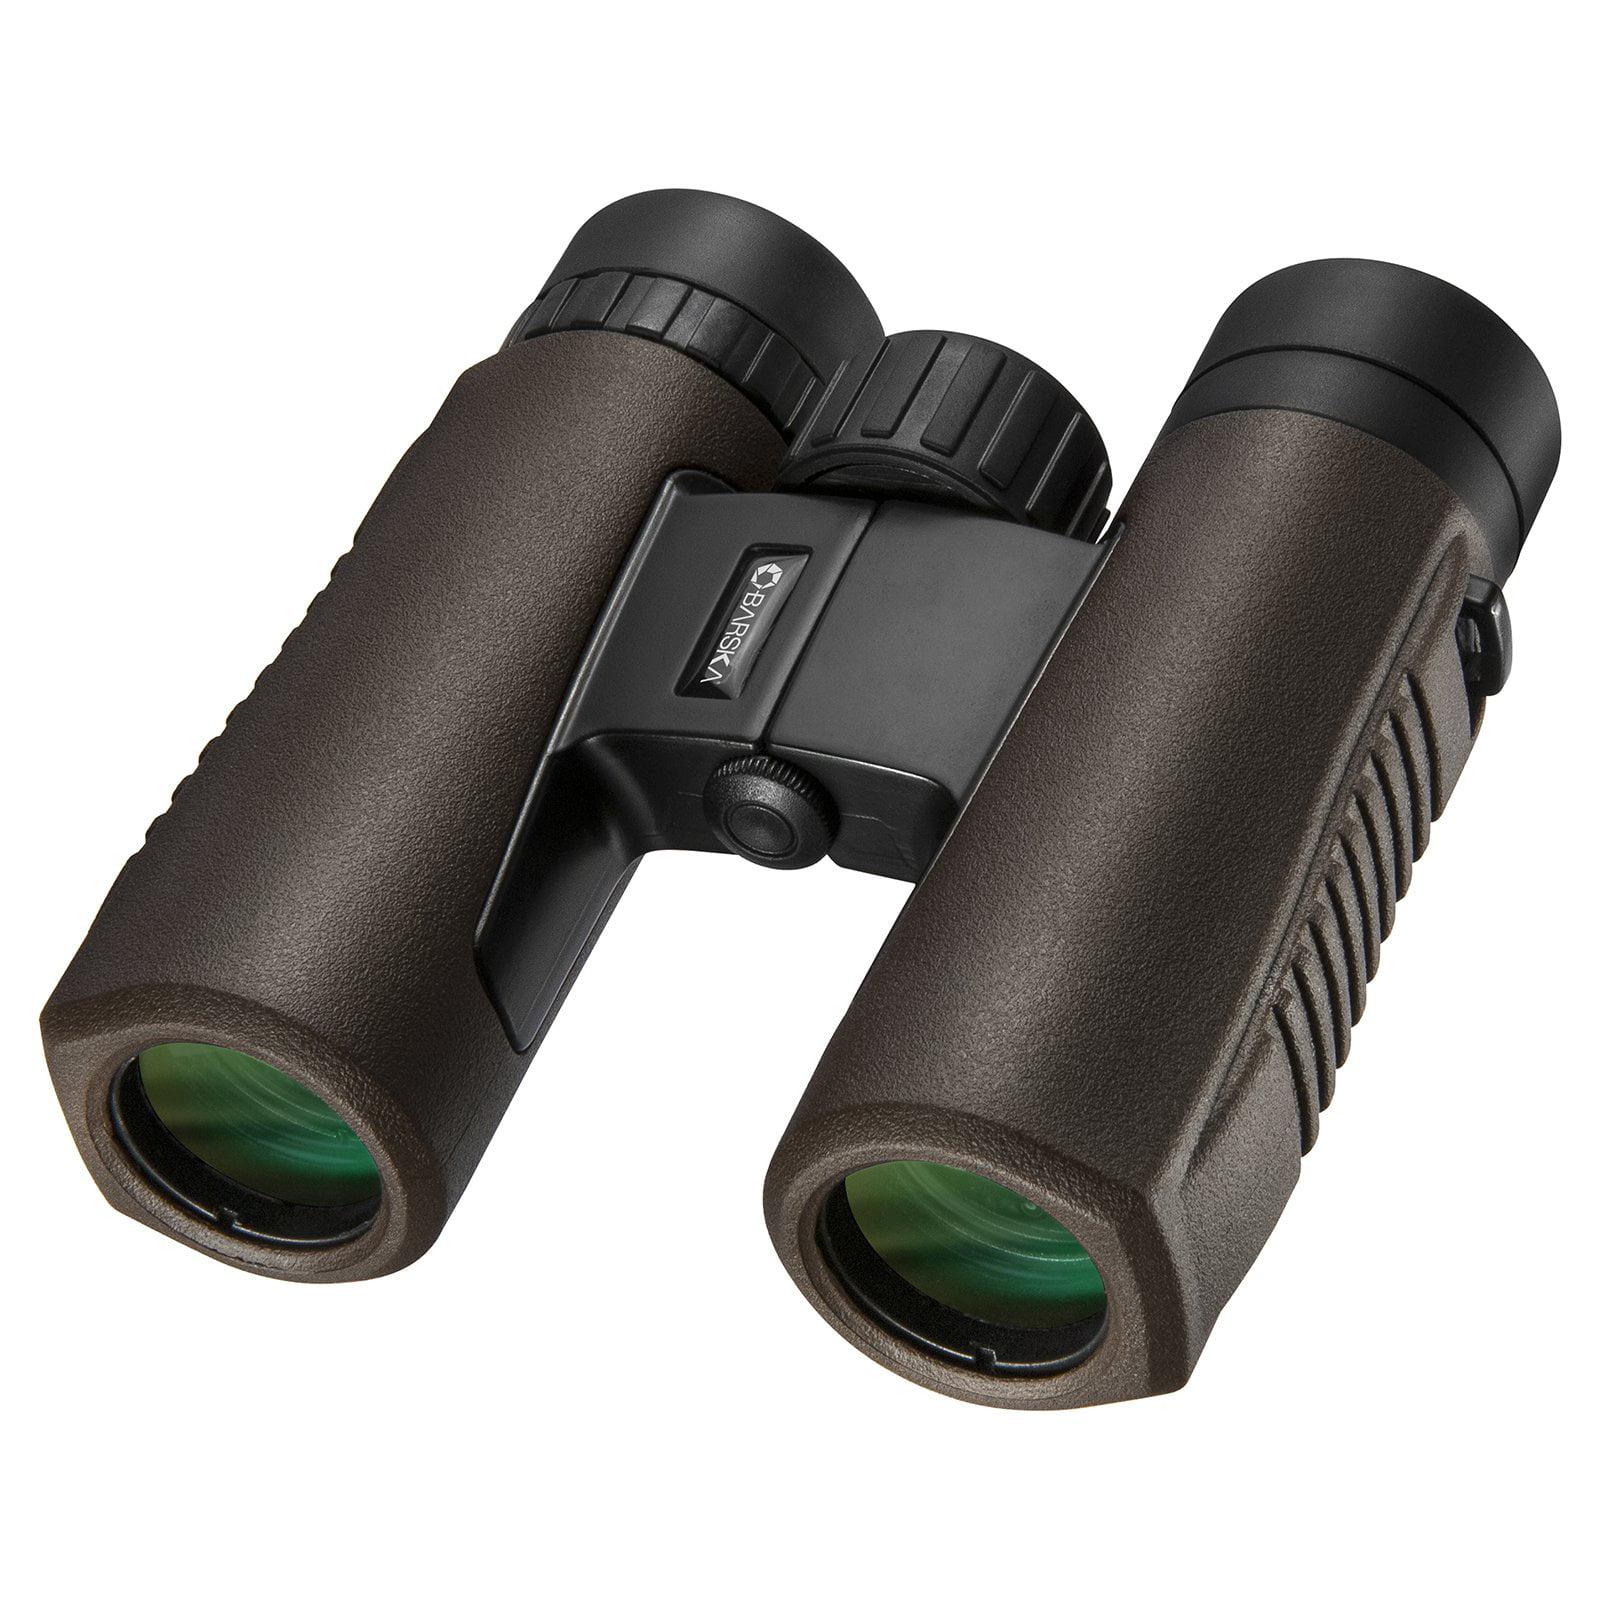 Barska Optics Embark Binoculars 10x26mm